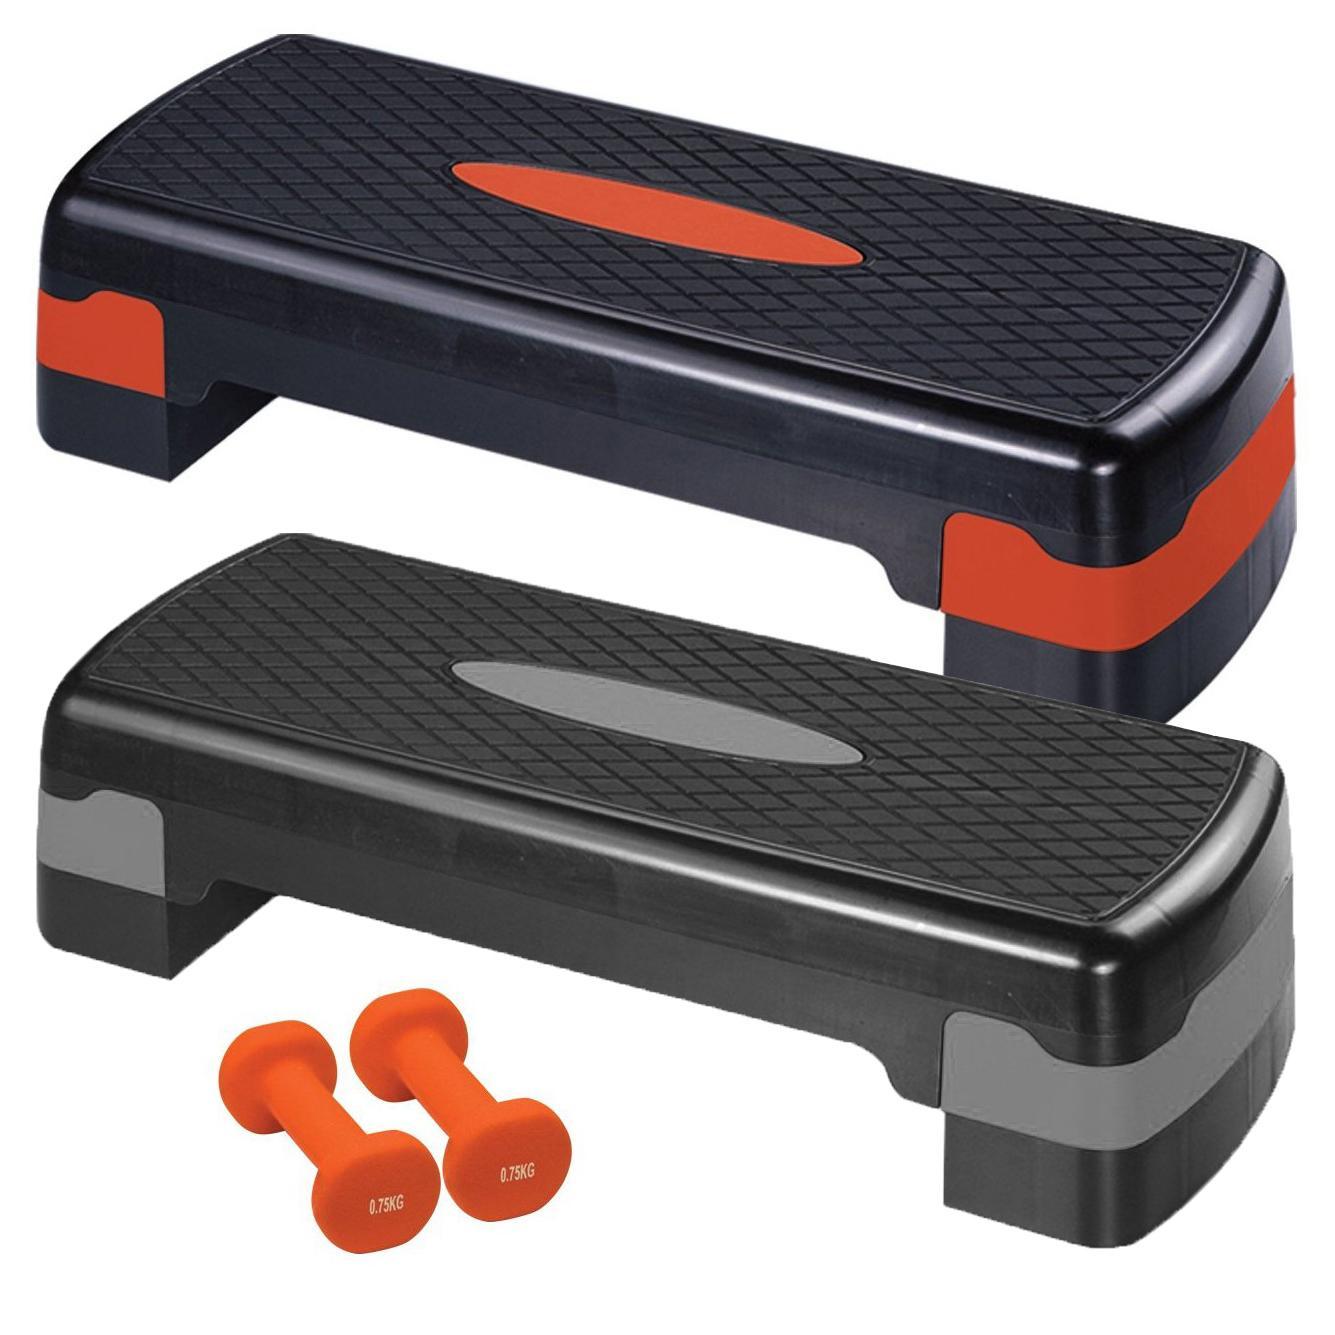 r/églable en hauteur Ultrasport Stepper da/érobic